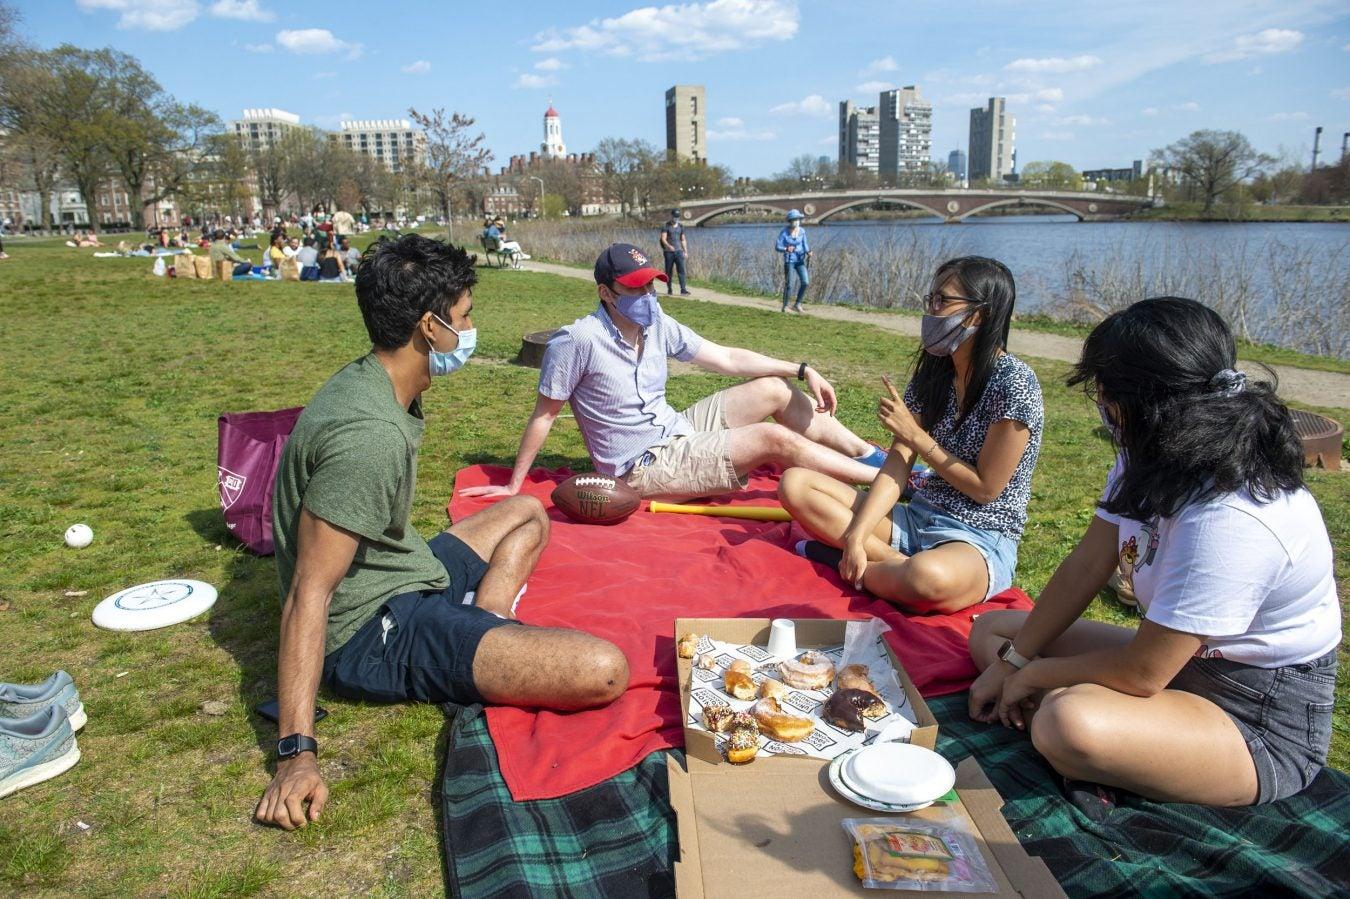 Devin Srivastava '21 (from left), Brooks Lambert, Nam Hyun Kim '21, and Ruth Jaensubhakij '22 gather on the grass between Memorial Drive and the river.